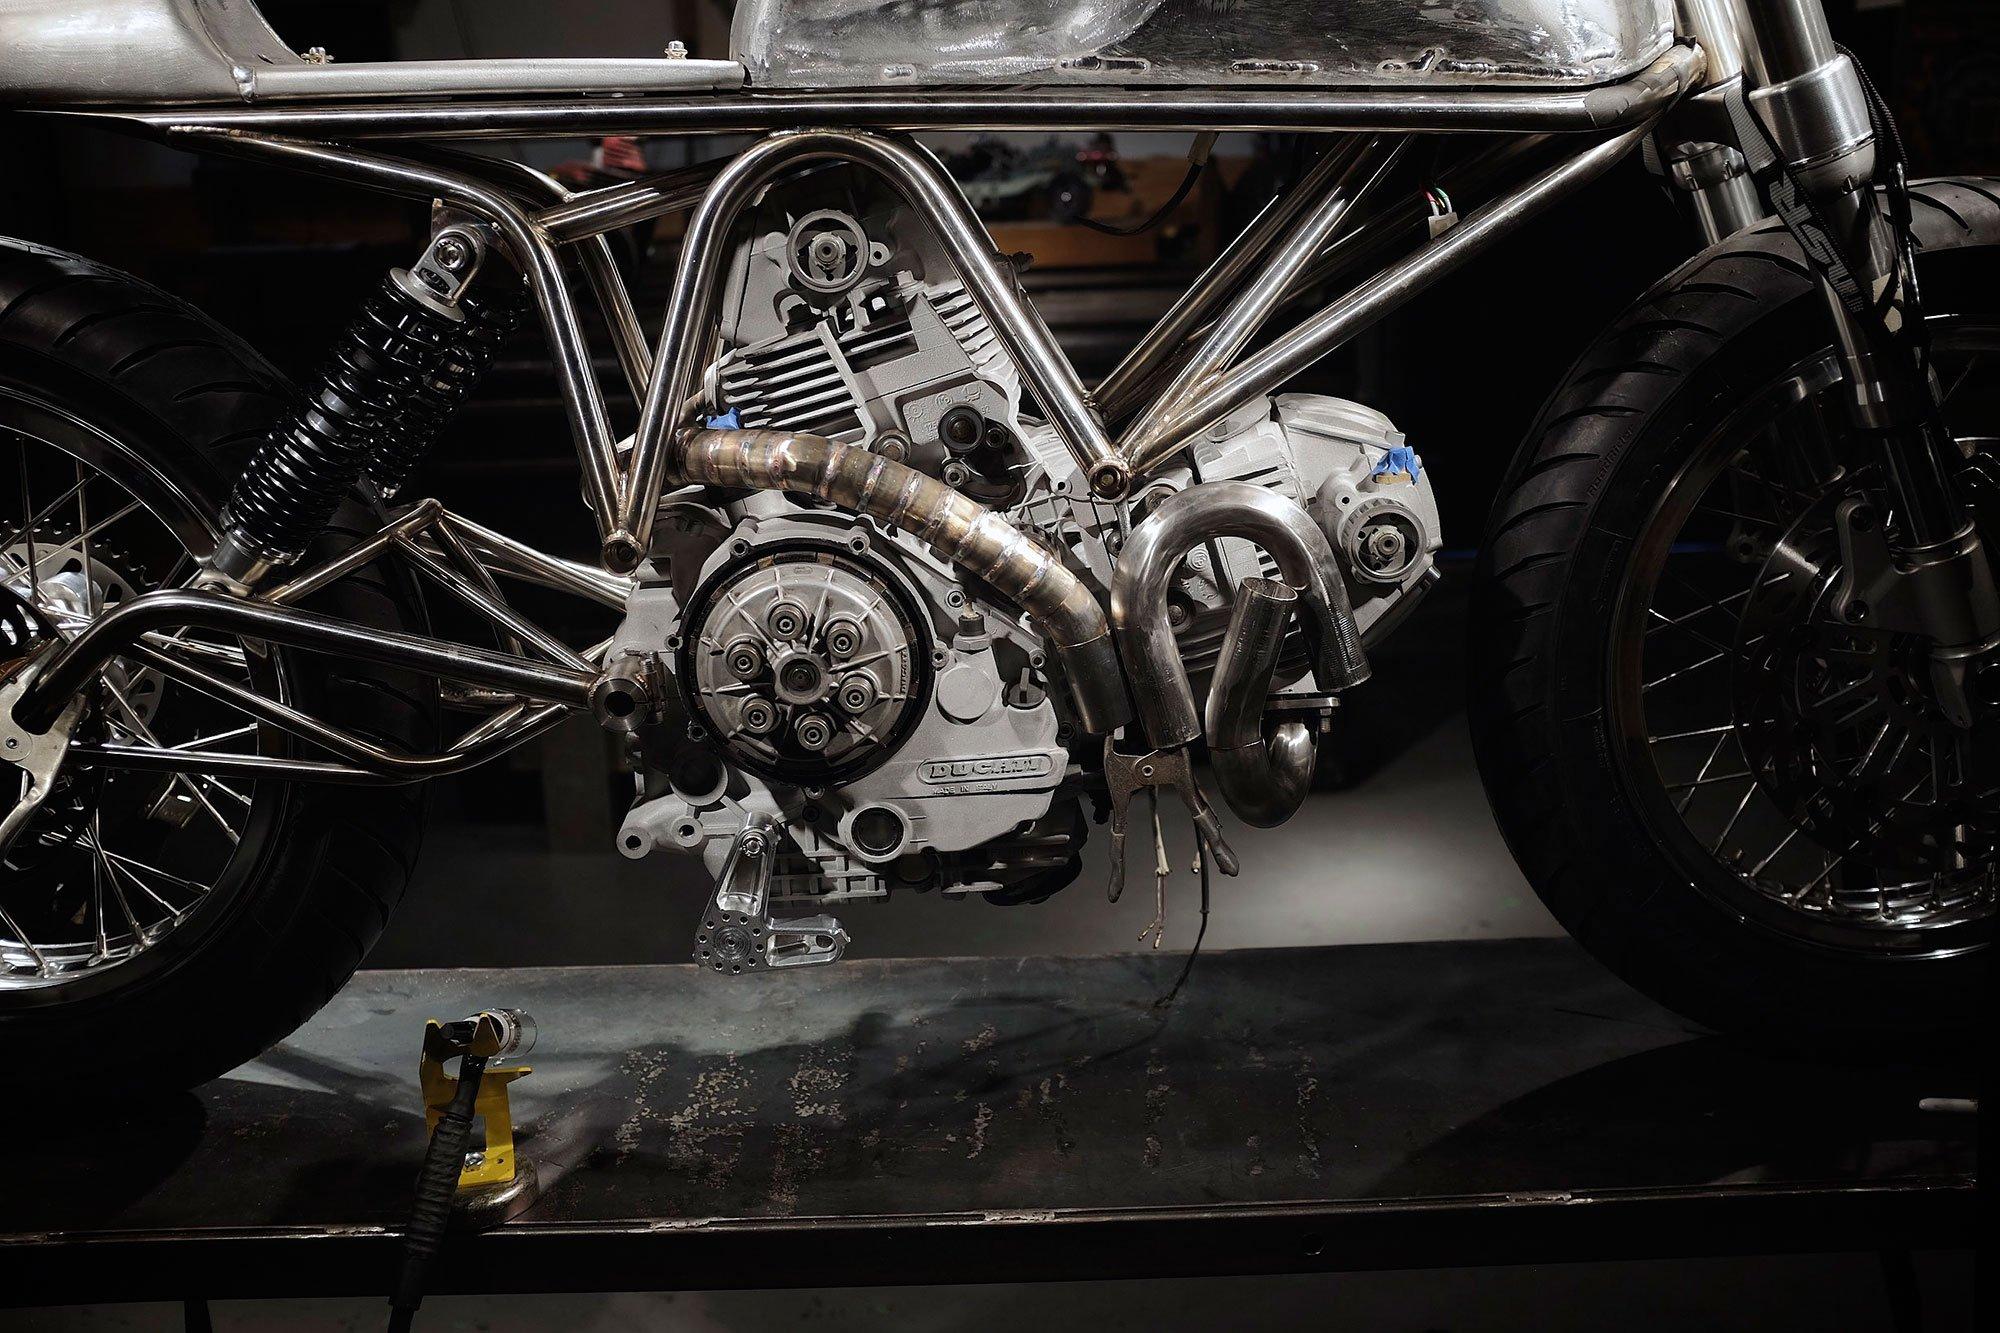 ducati-900ss-sp-j63-custom-build-by-revival-cycles-11